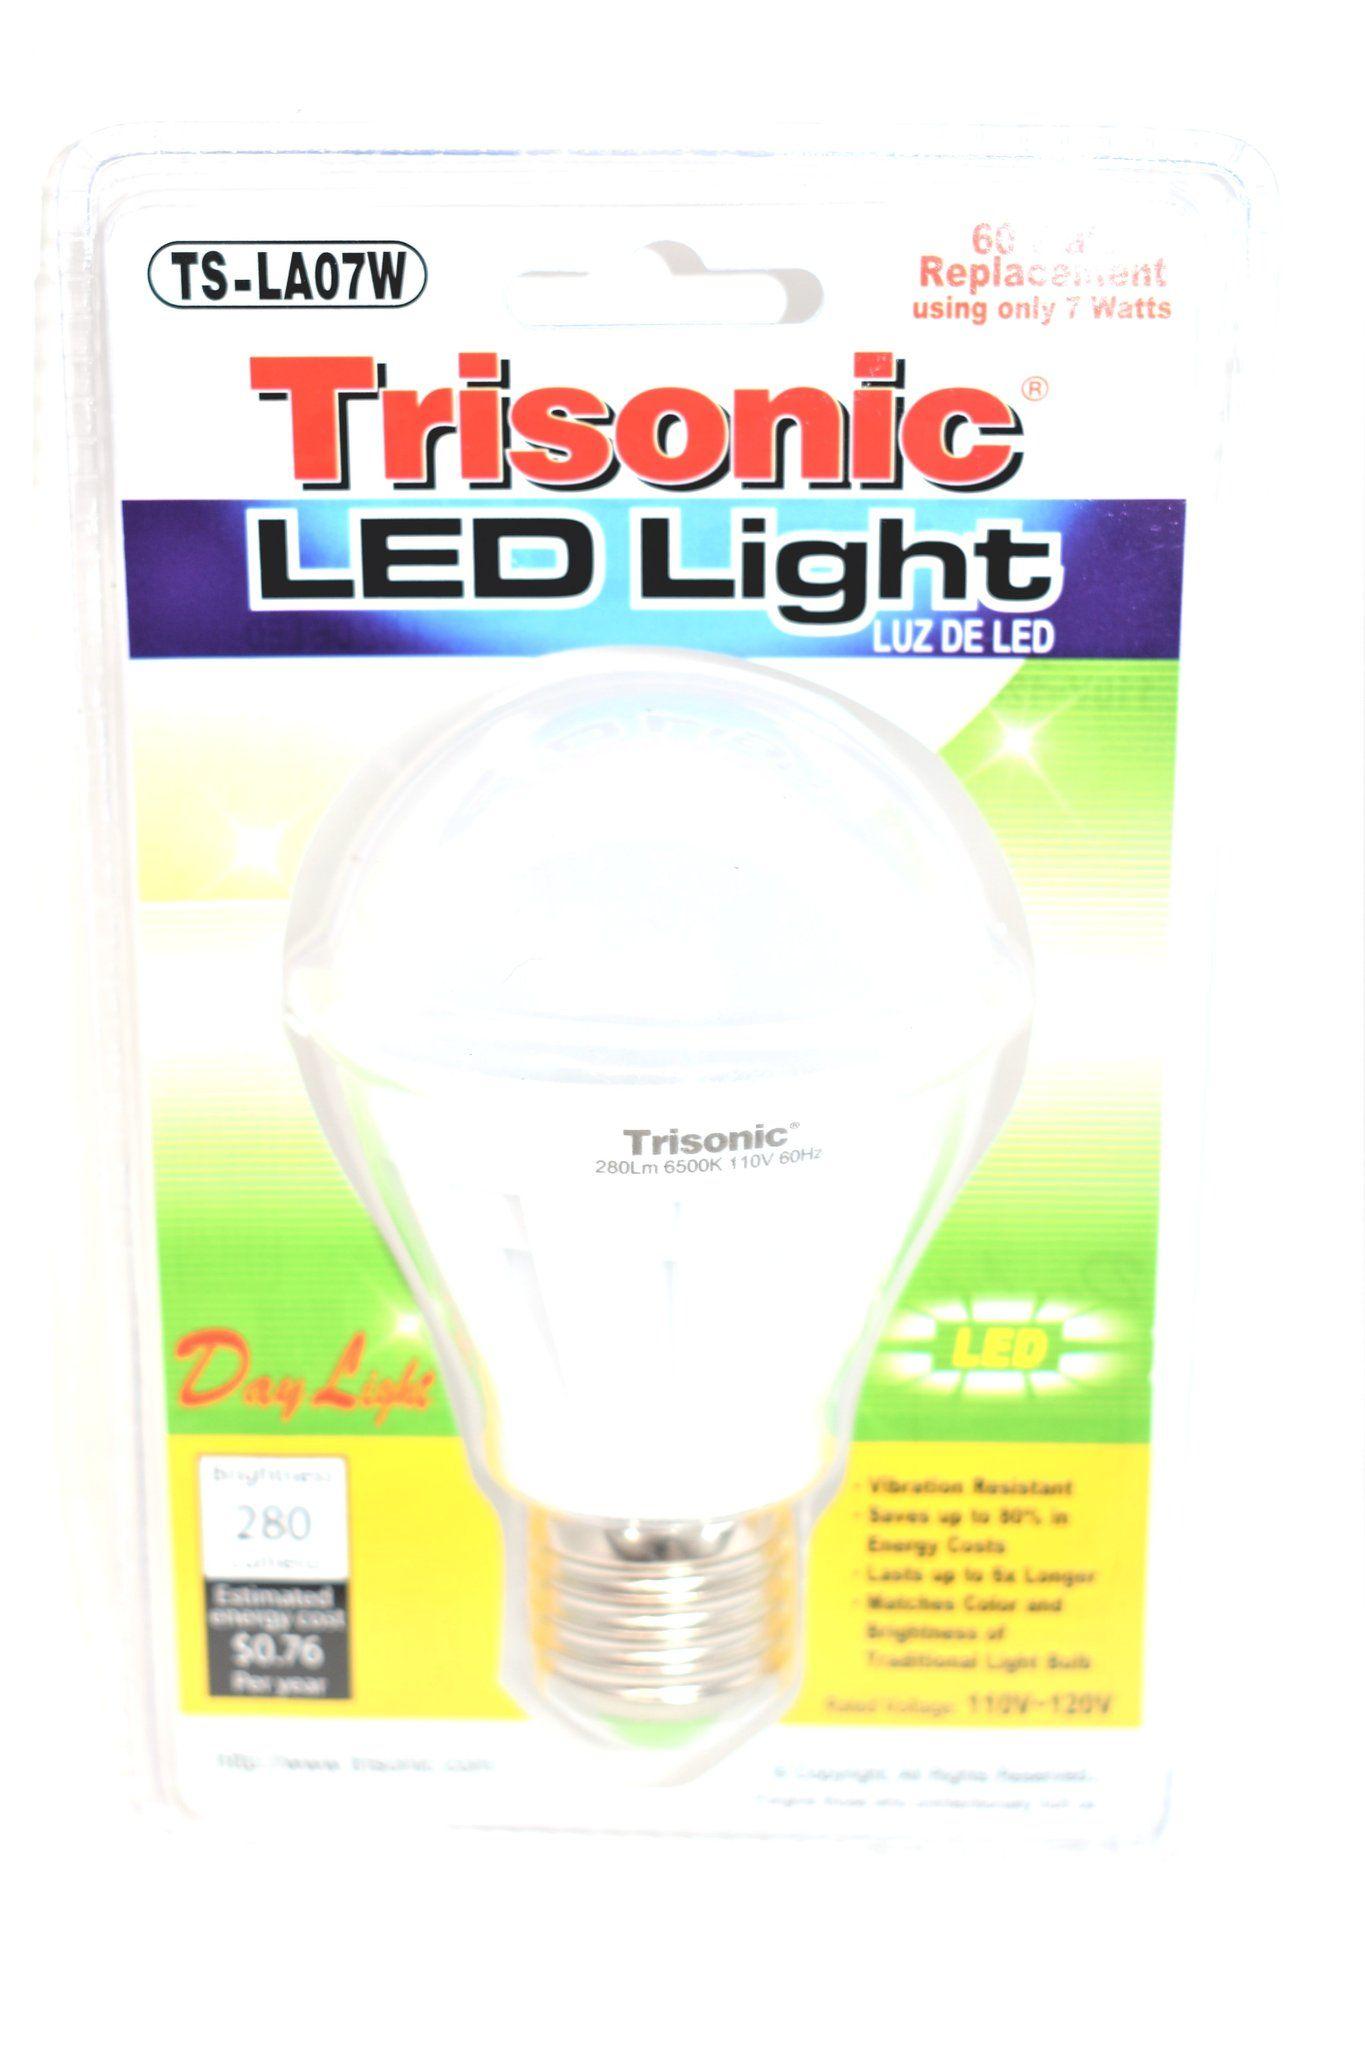 7 Watt 60 Watt Equivalent Energy Saving Led Light Bulb Day Light Led Light Bulb Save Energy Light Bulb